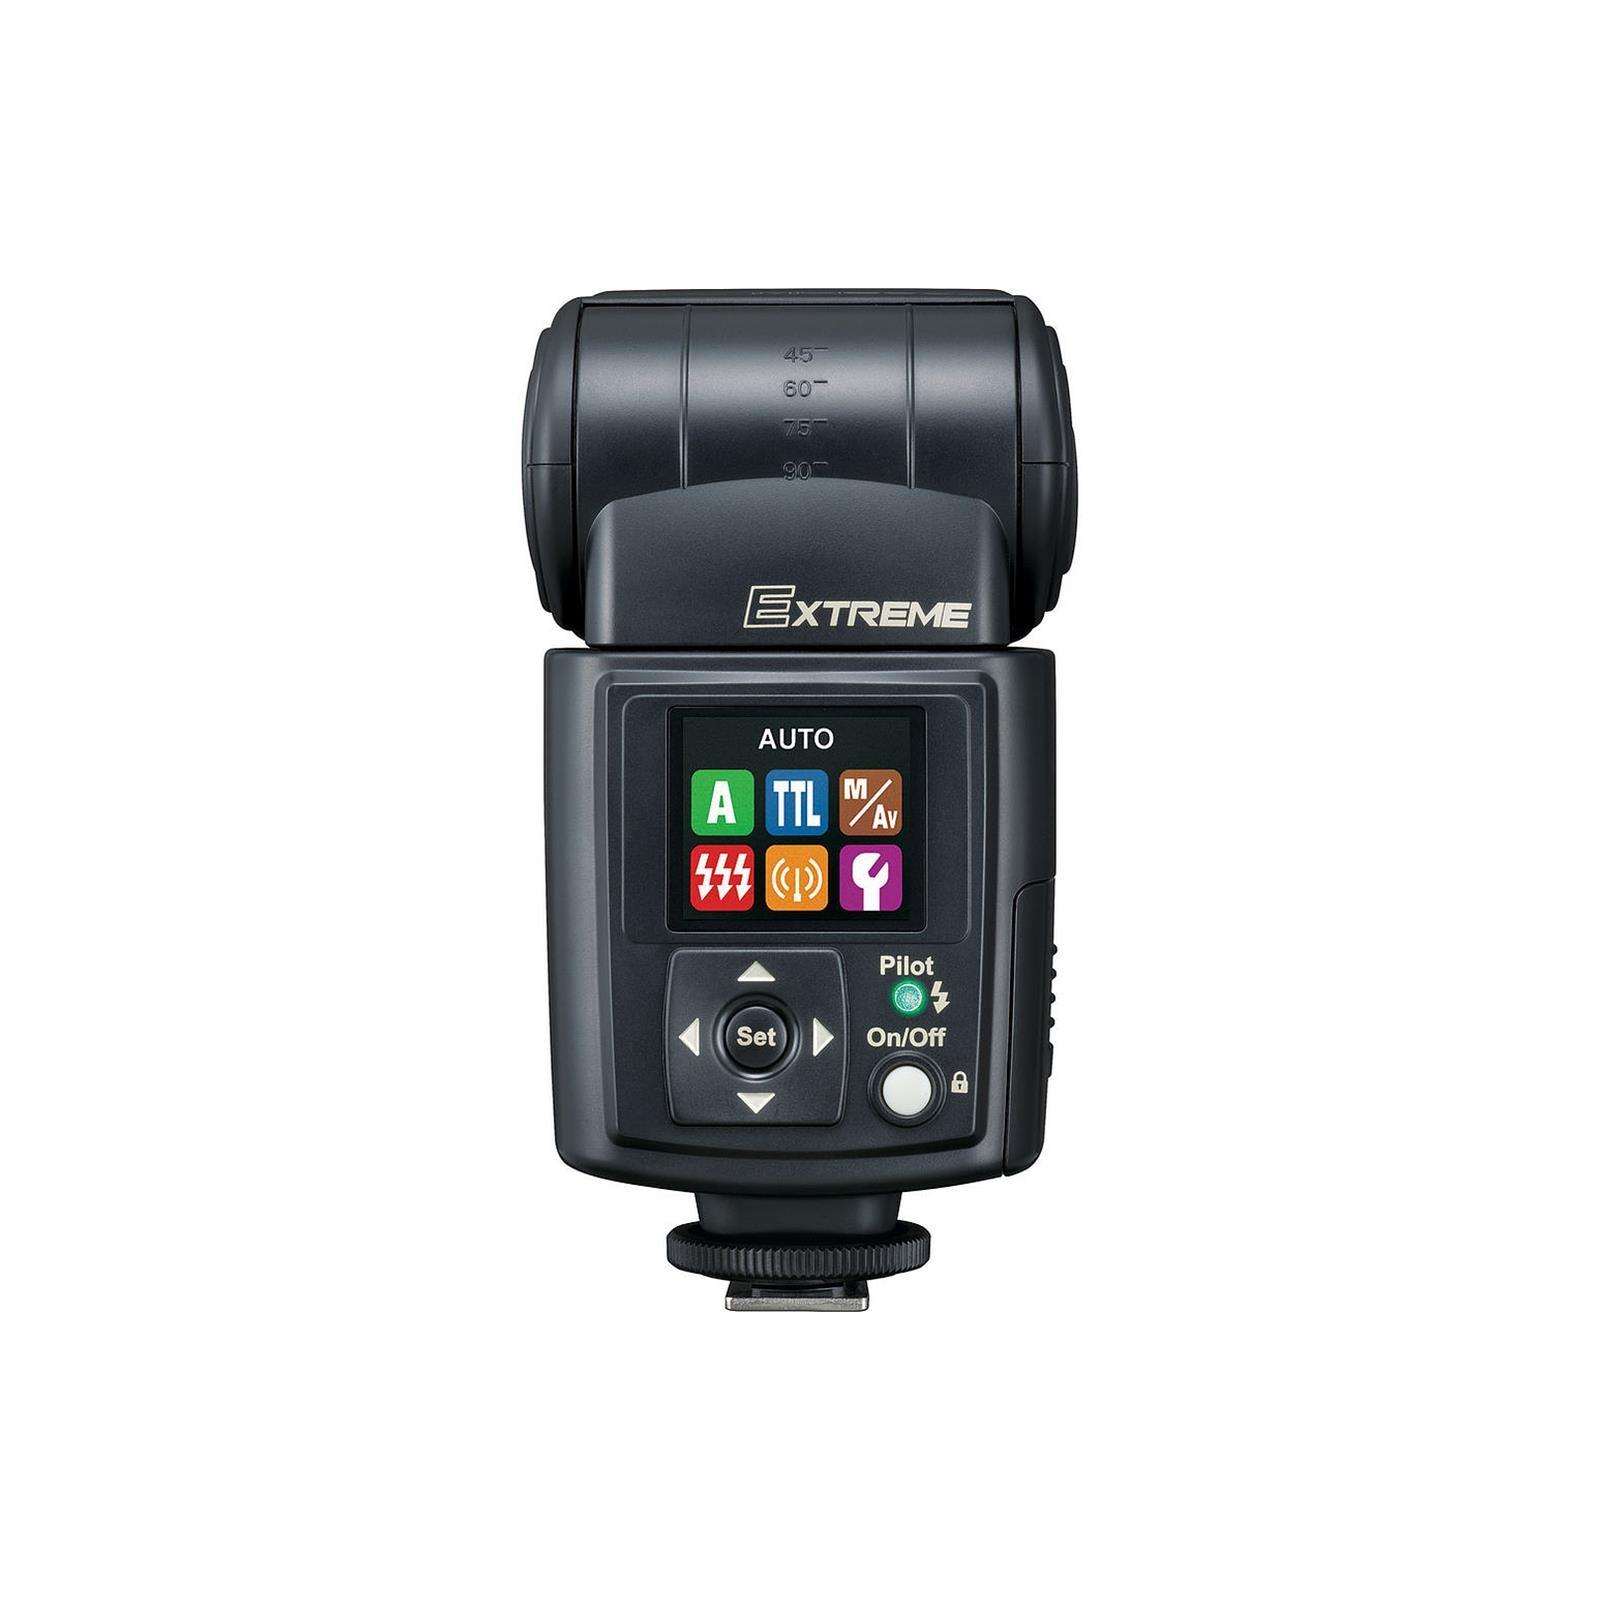 Вспышка Nissin MG8000 Nikon (NI-N065) изображение 2